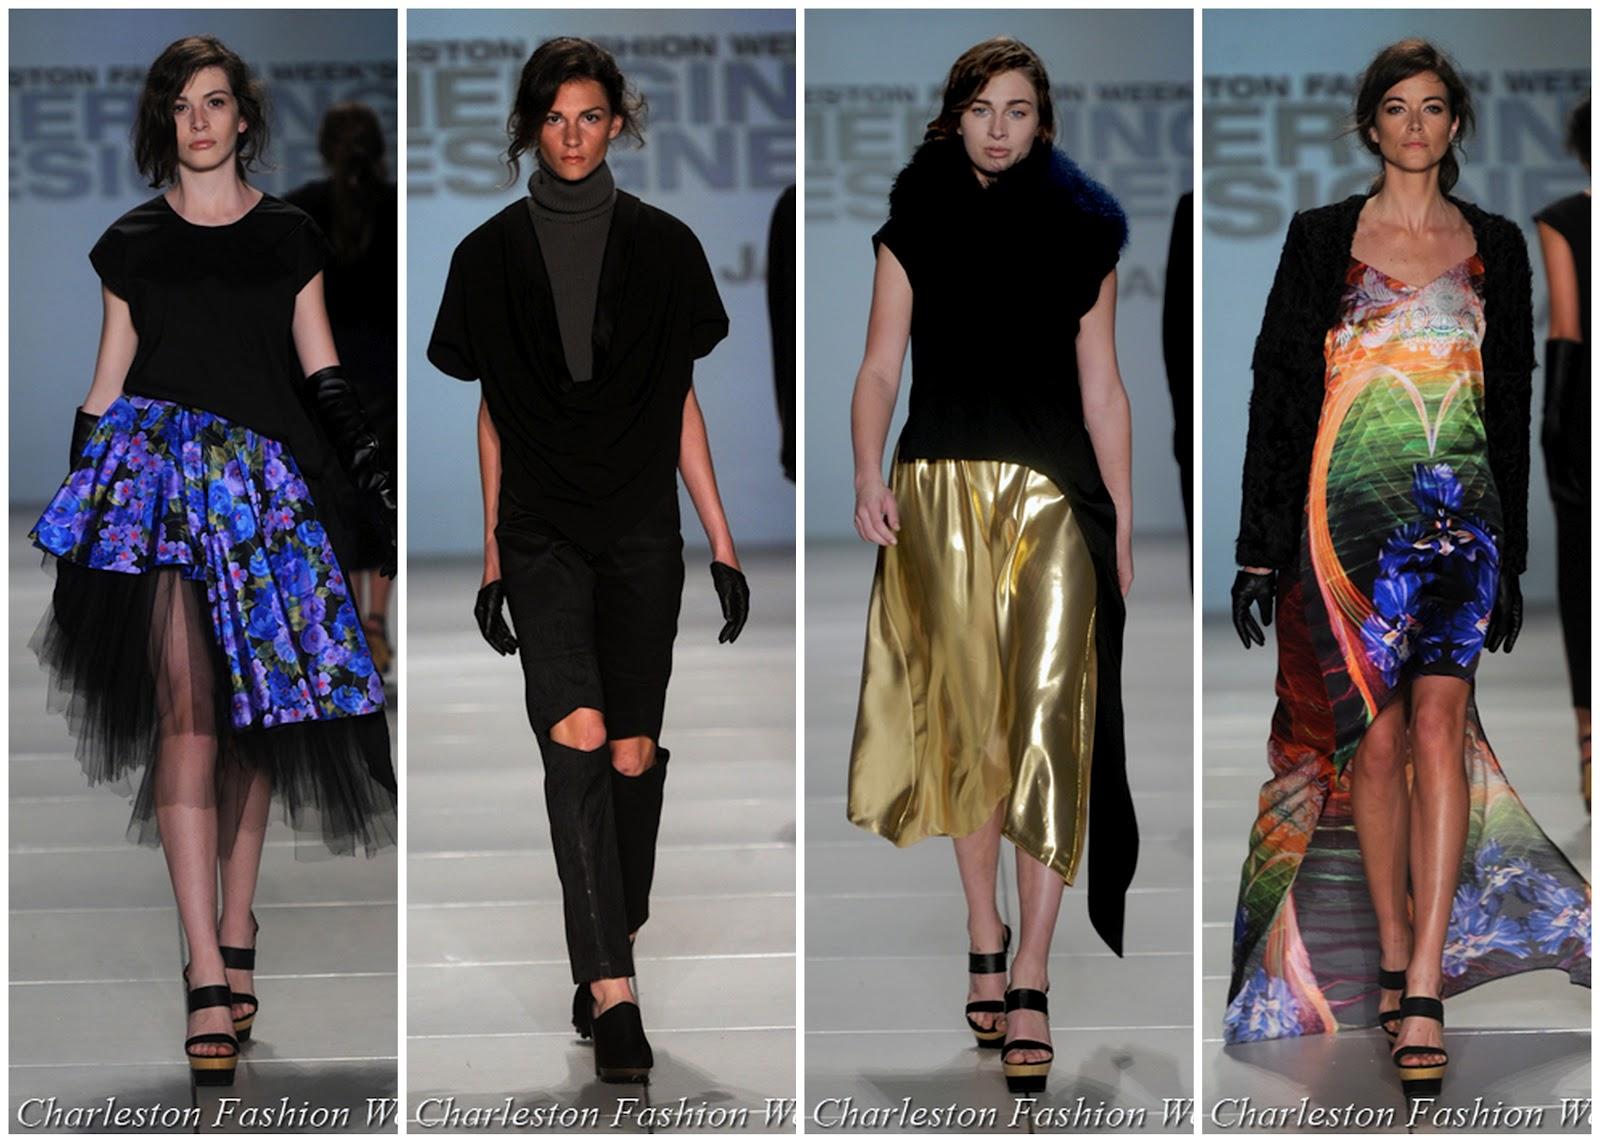 Look Linger Love Charleston Fashion Week 2012 Wednesday